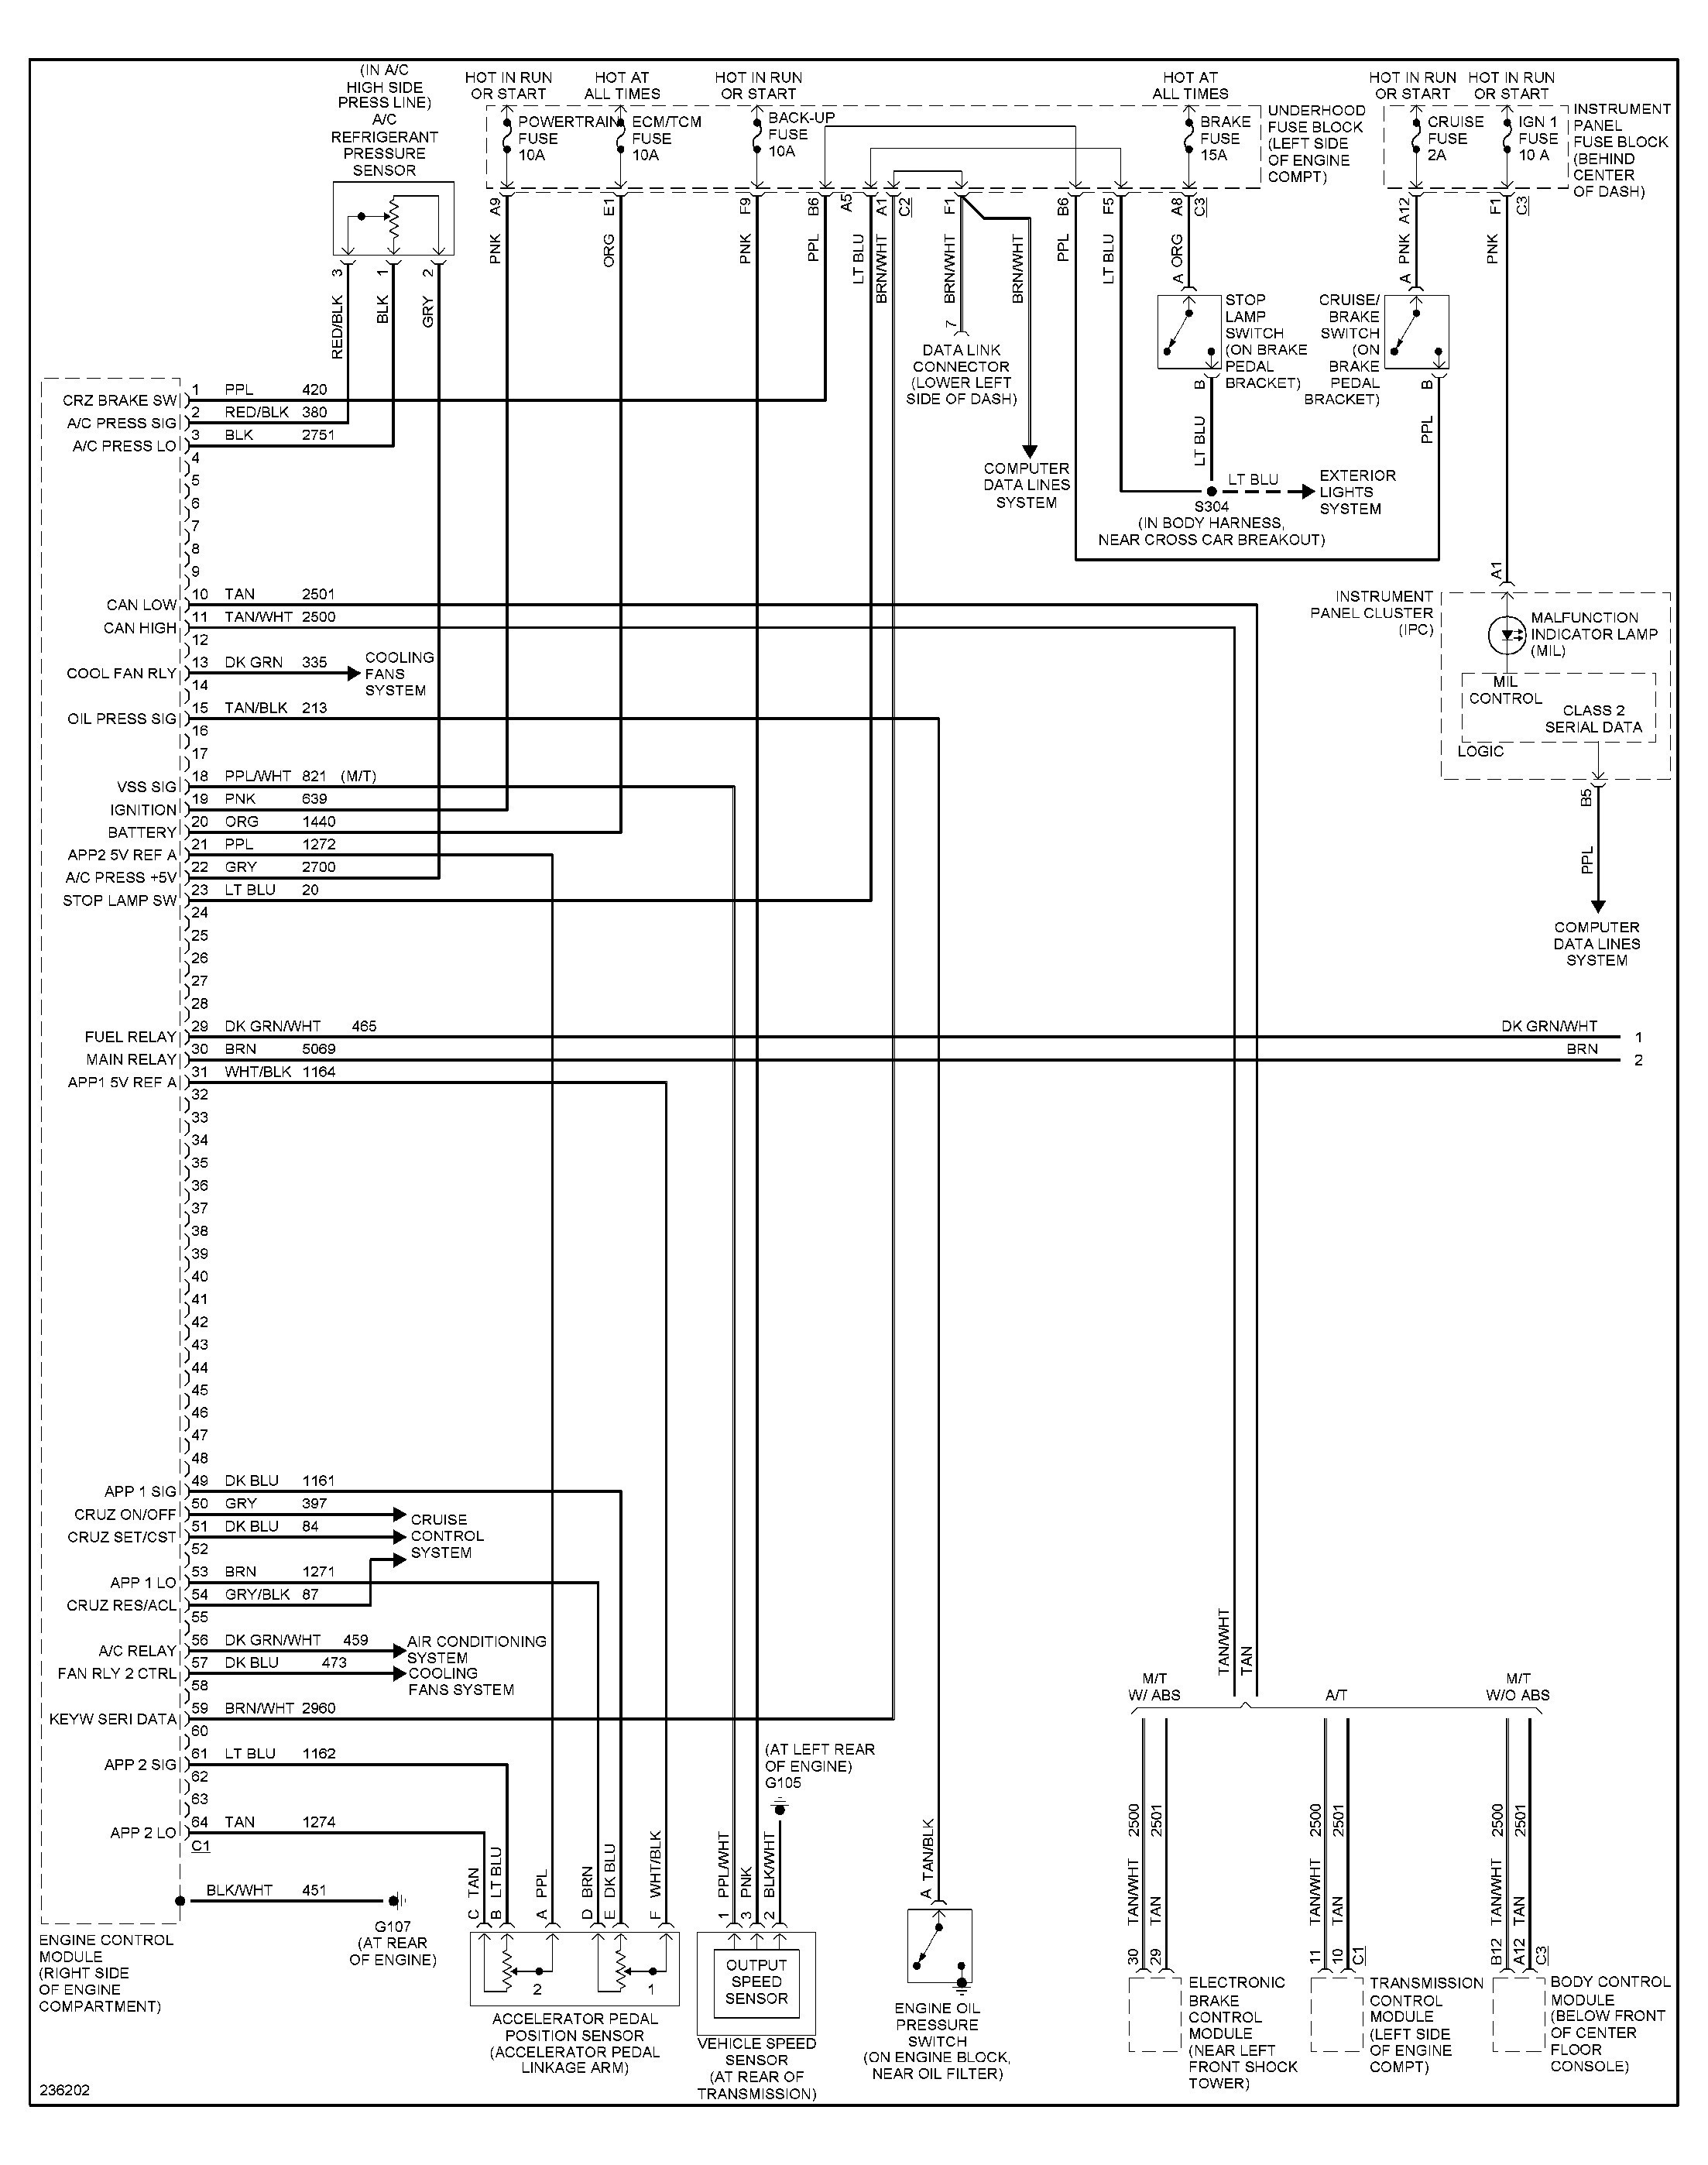 Saturn Ion Engine Diagram Saturn L200 Ac Wiring Diagram Saturn Wiring Diagrams Instructions Of Saturn Ion Engine Diagram